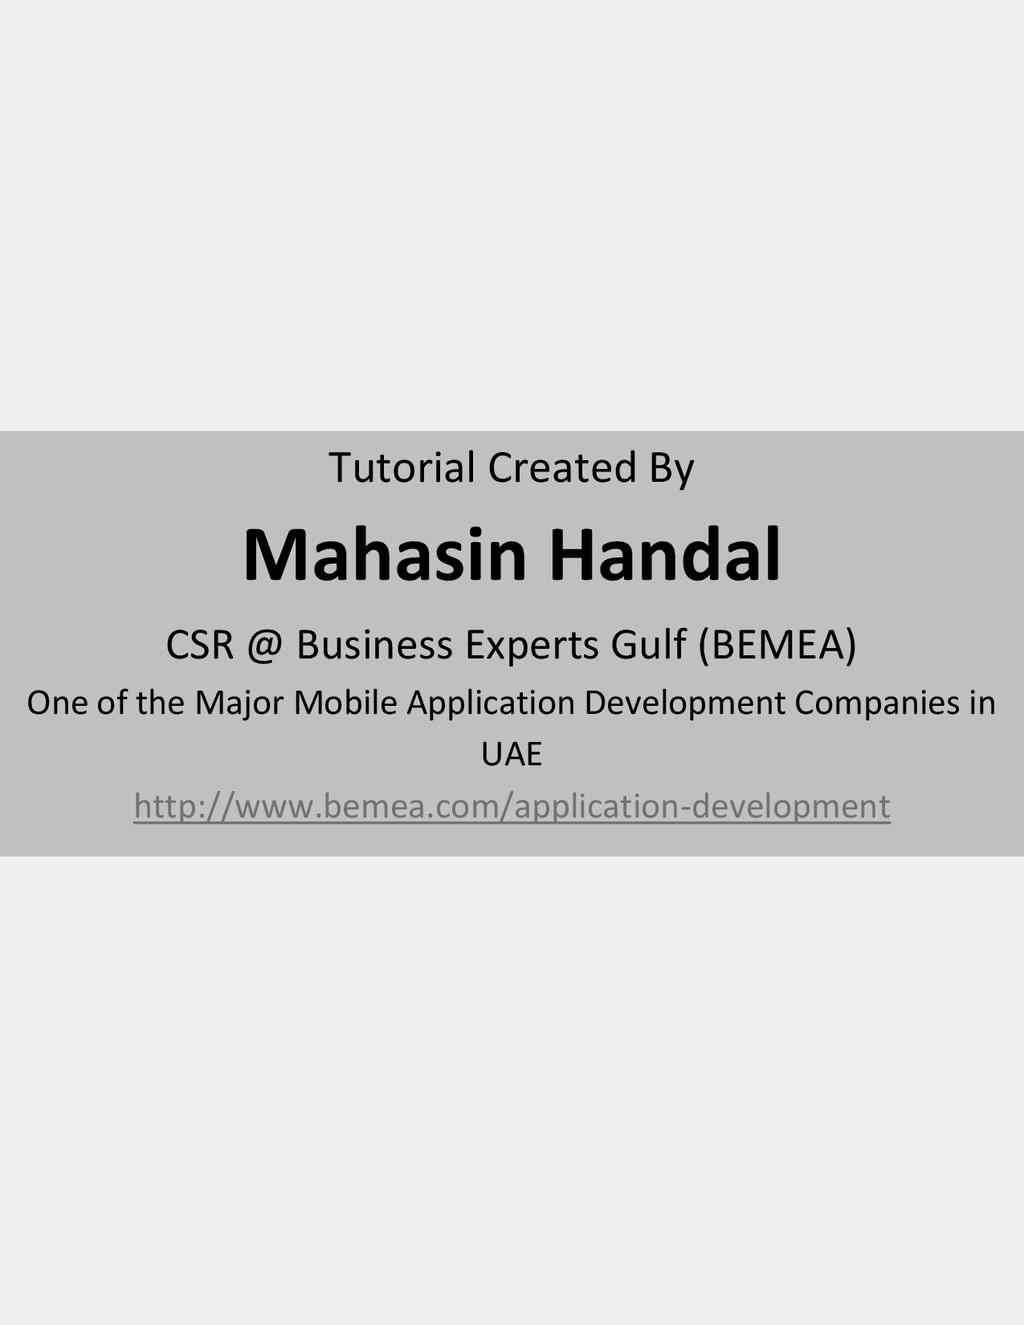 Tutorial Created By Mahasin Handal CSR @ Busine...